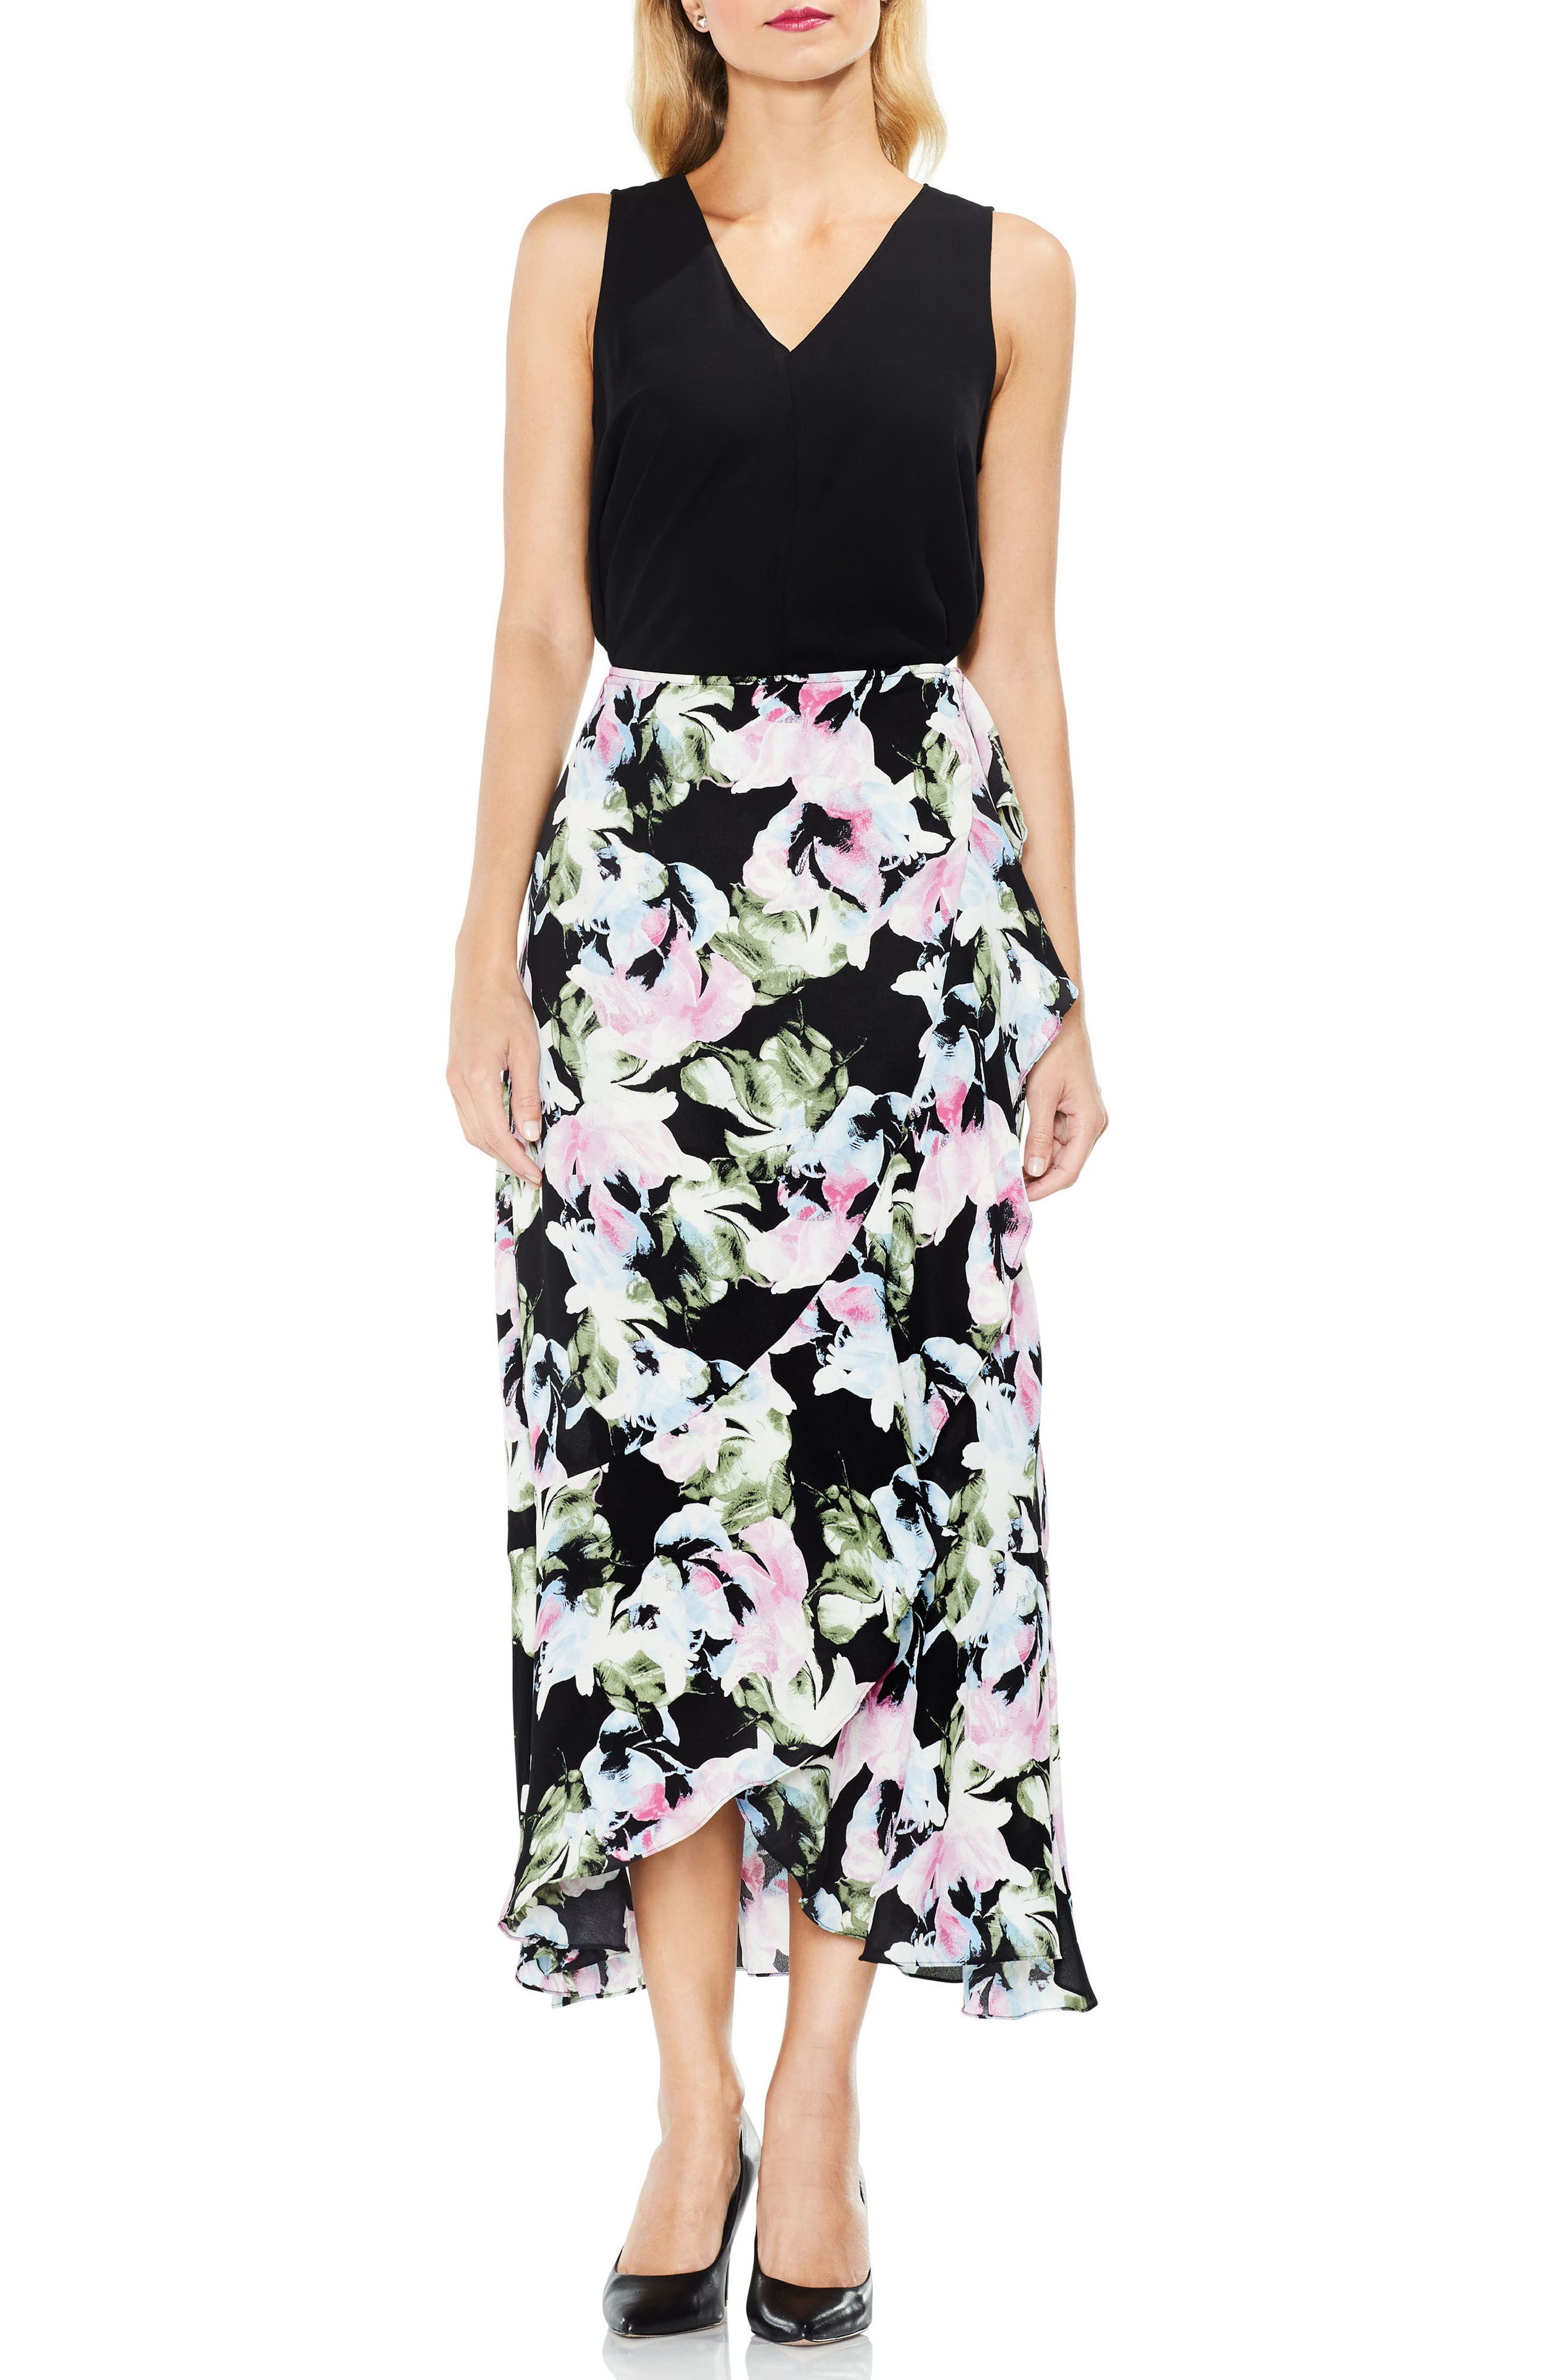 Glacier Floral Ruffle Skirt,                             Alternate thumbnail 3, color,                             Rich Black